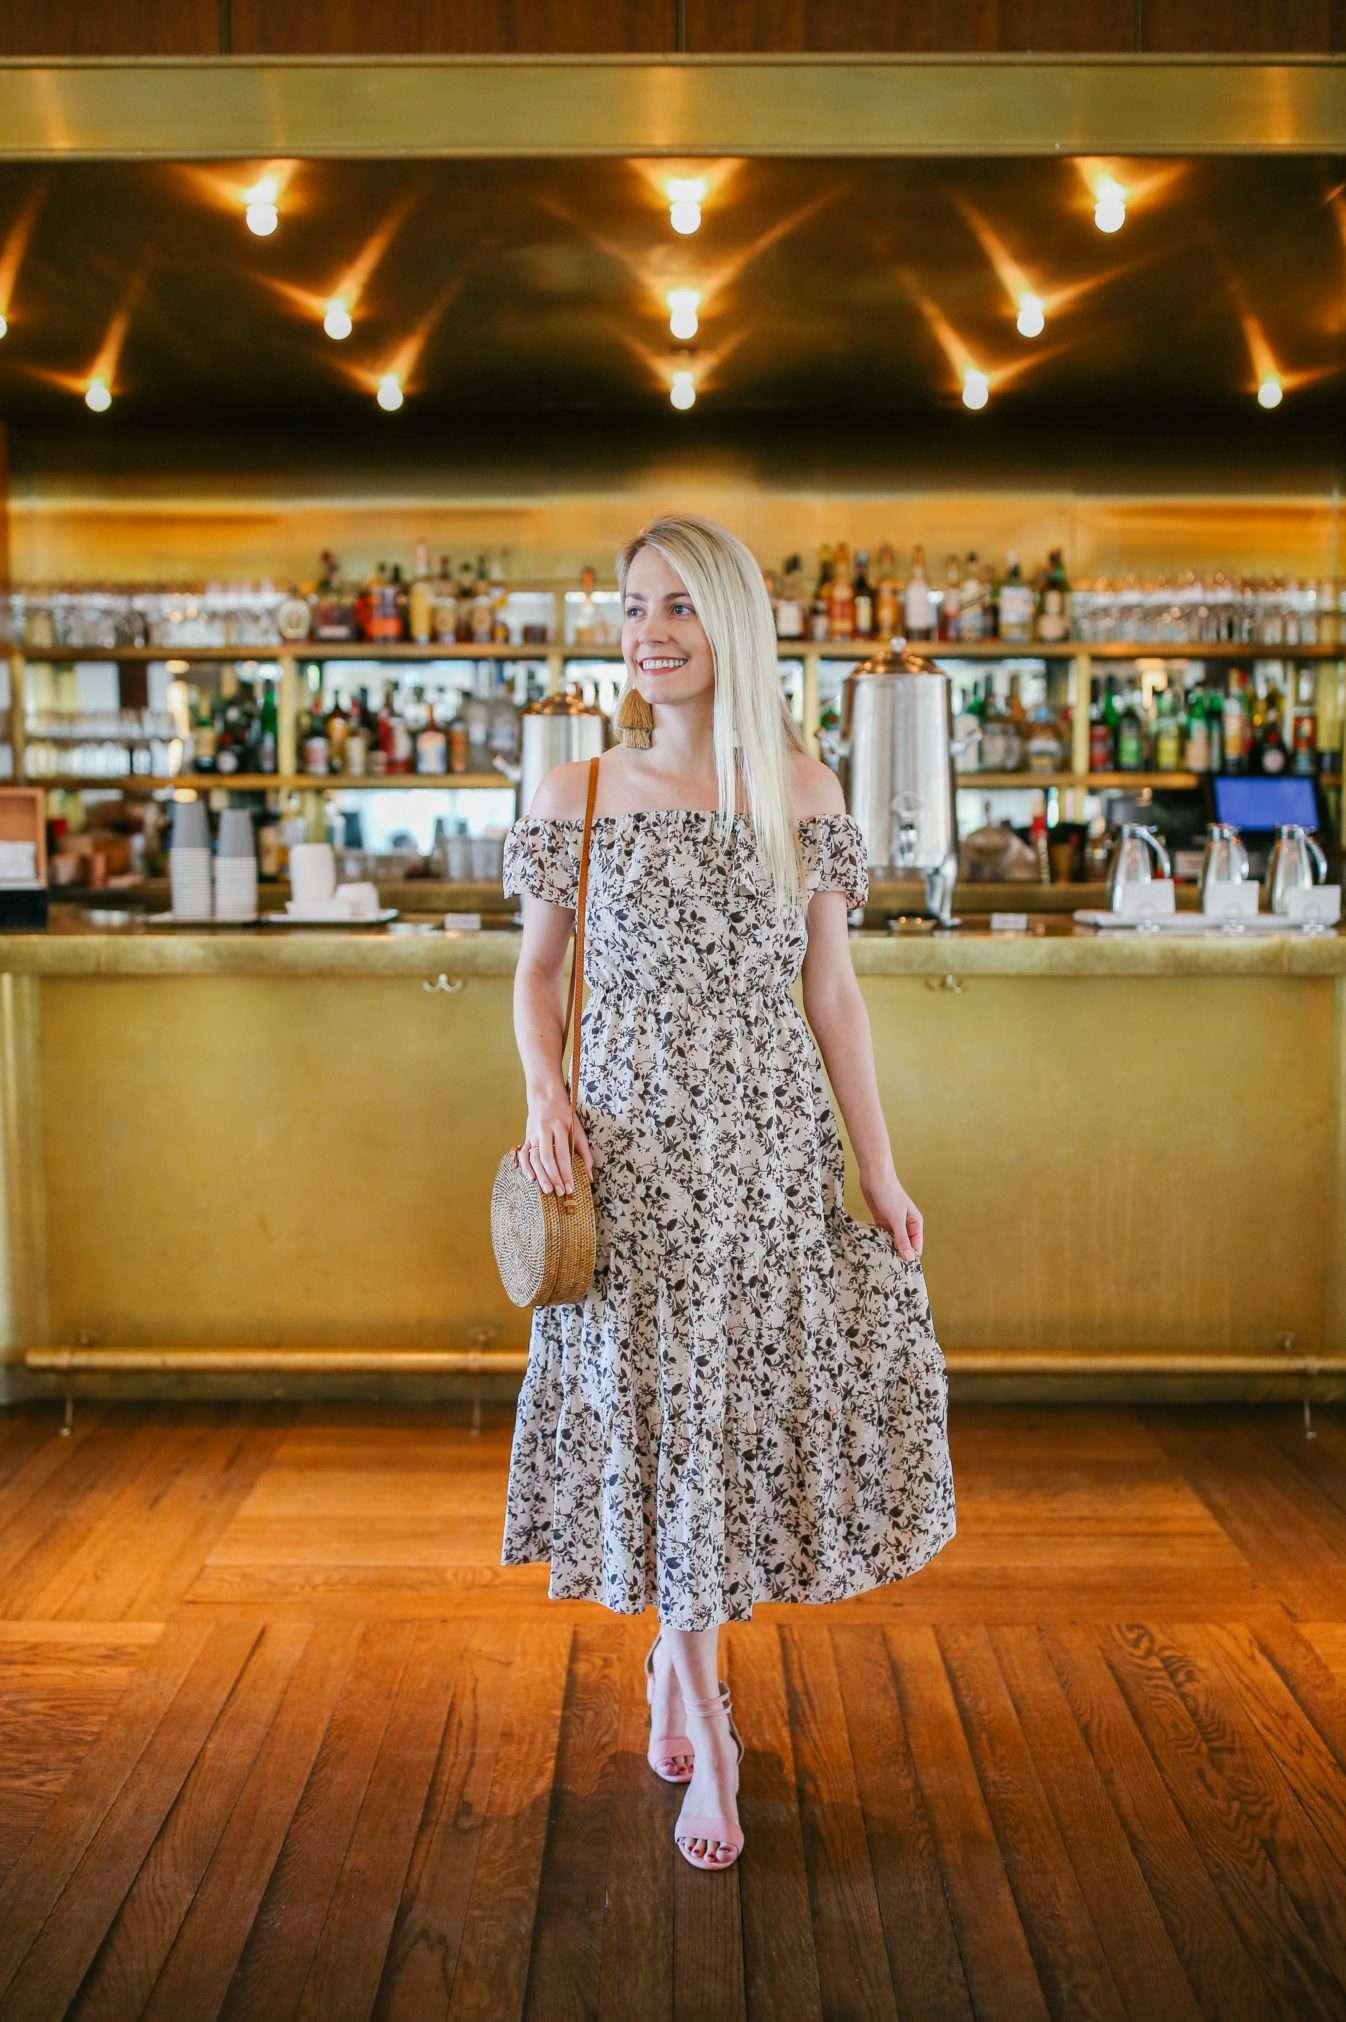 The 40 Best Bars In Charleston SC | Rhyme & Reason